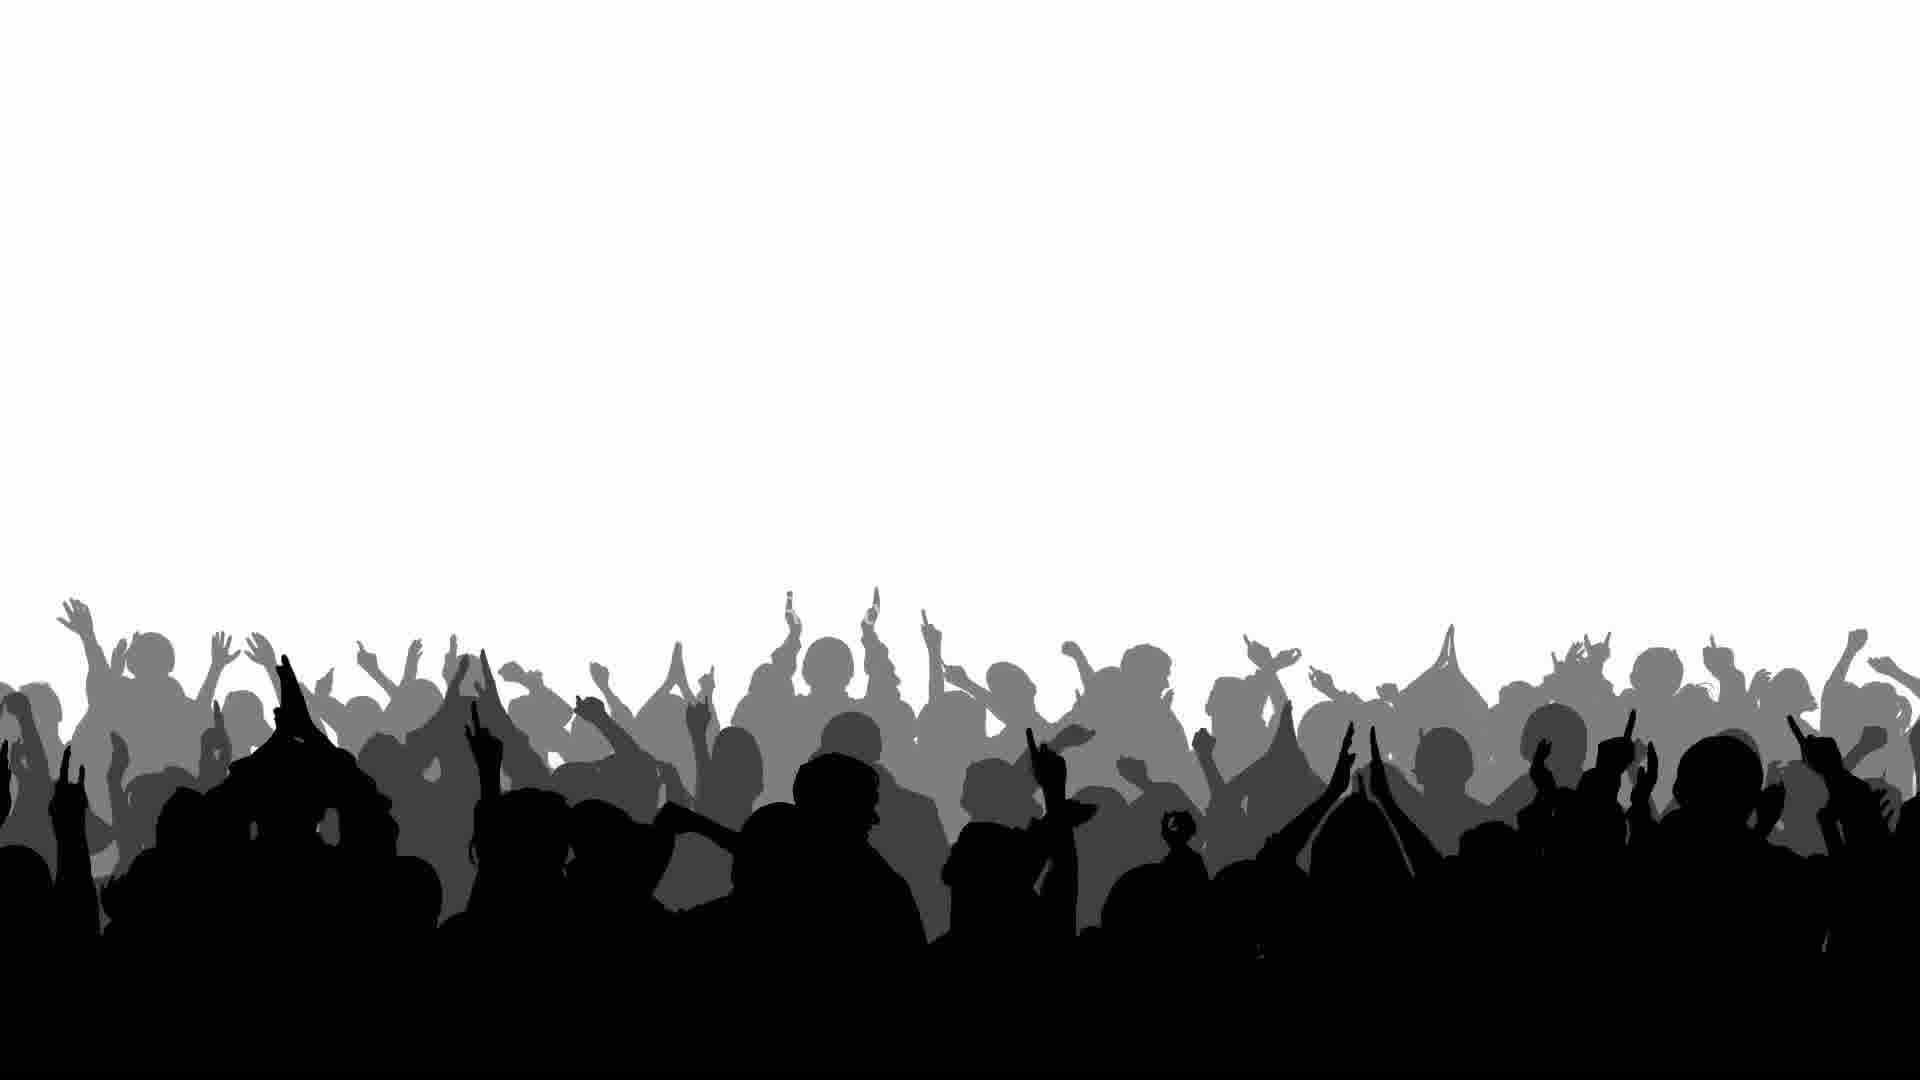 1920x1080 Crowd Clipart Silhouette